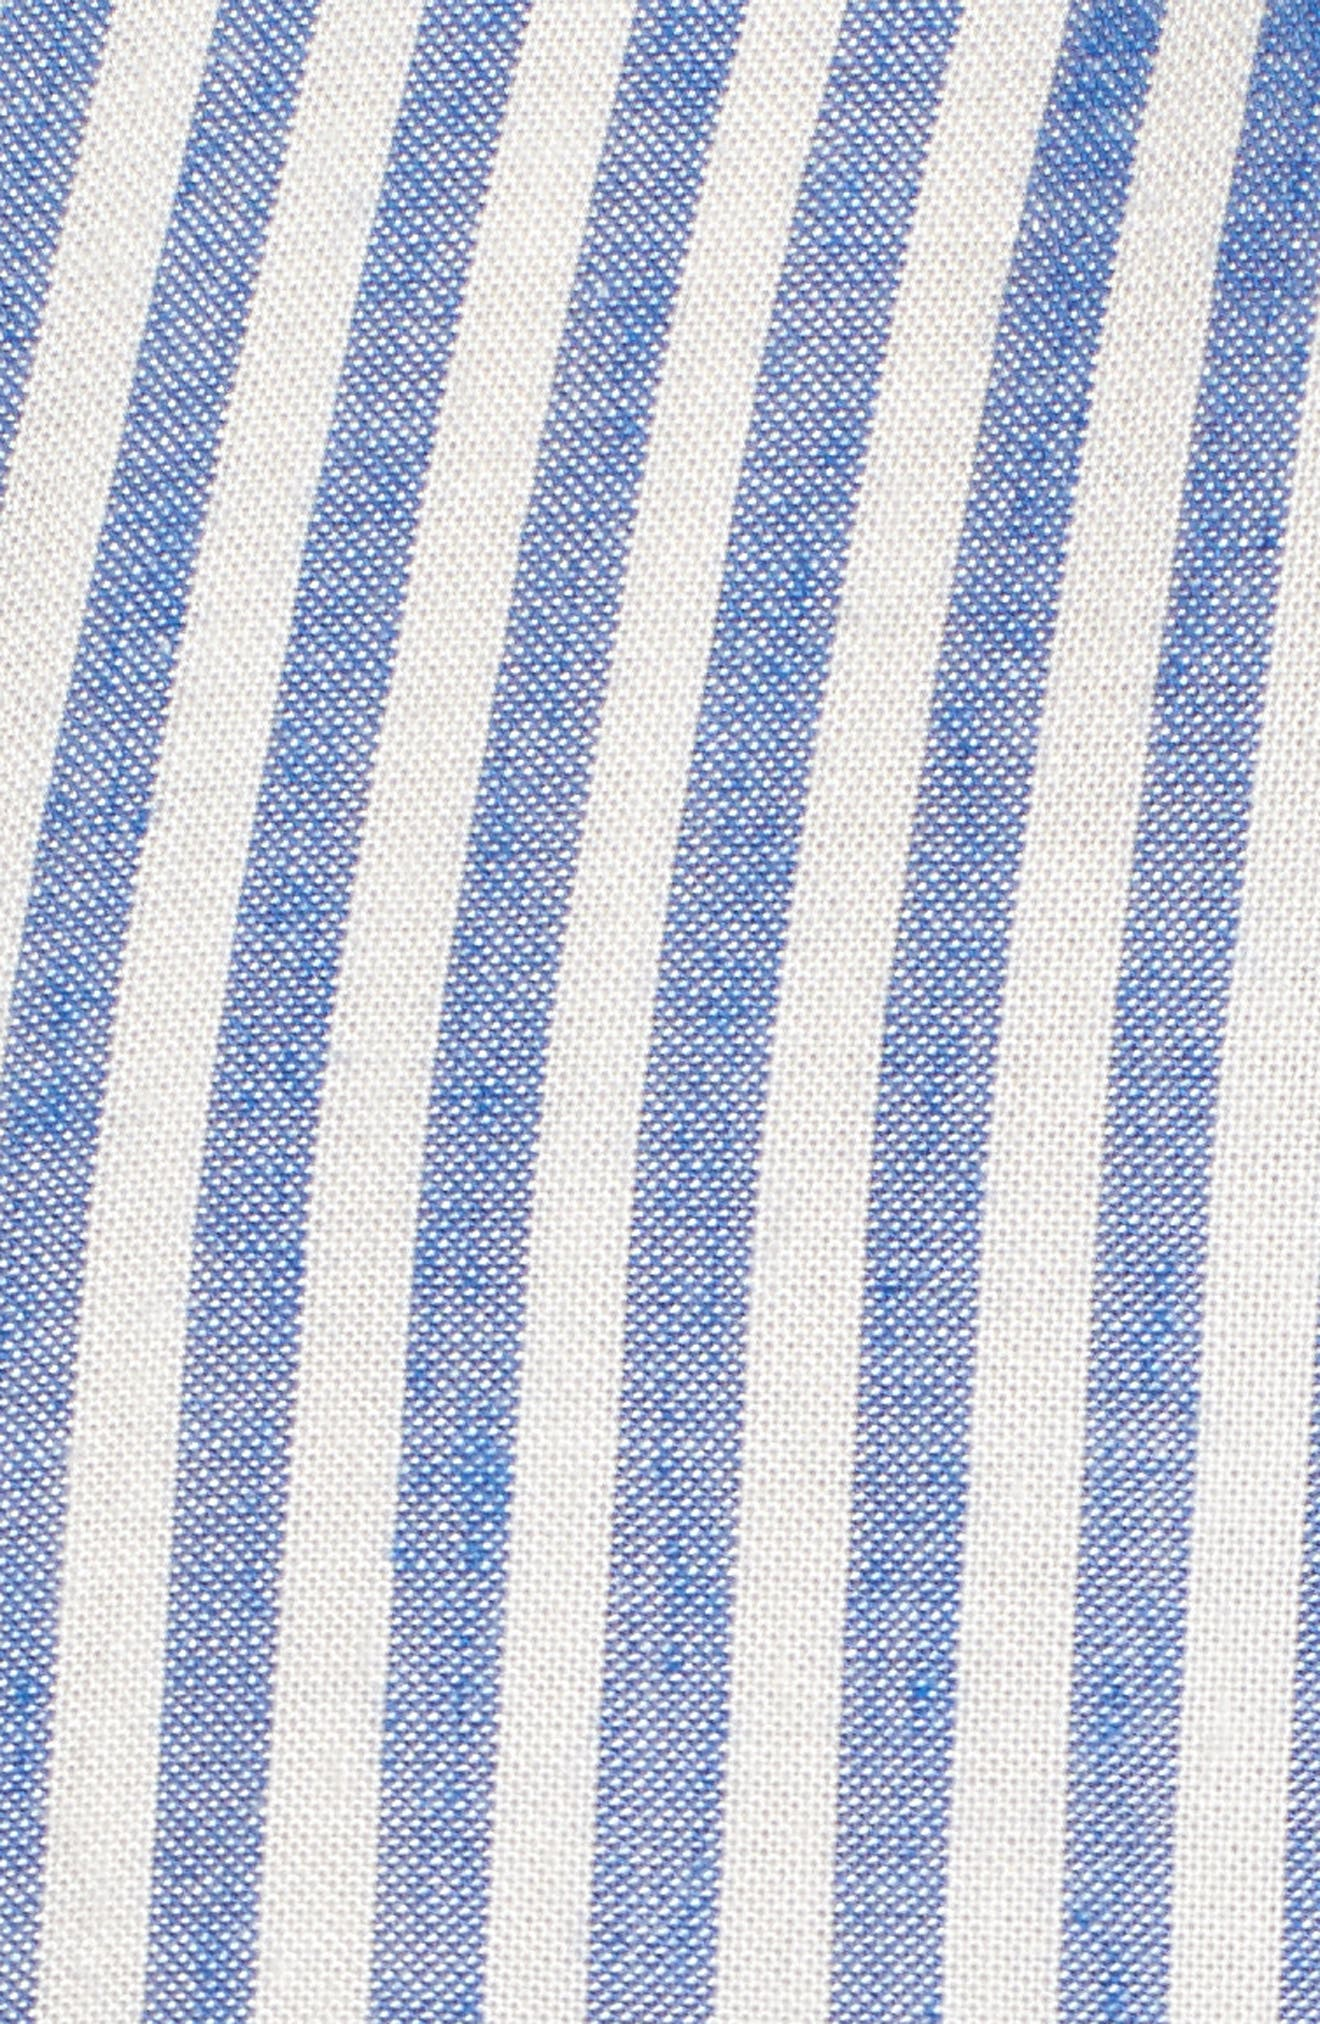 Stripe Top,                             Alternate thumbnail 5, color,                             Denim/ White